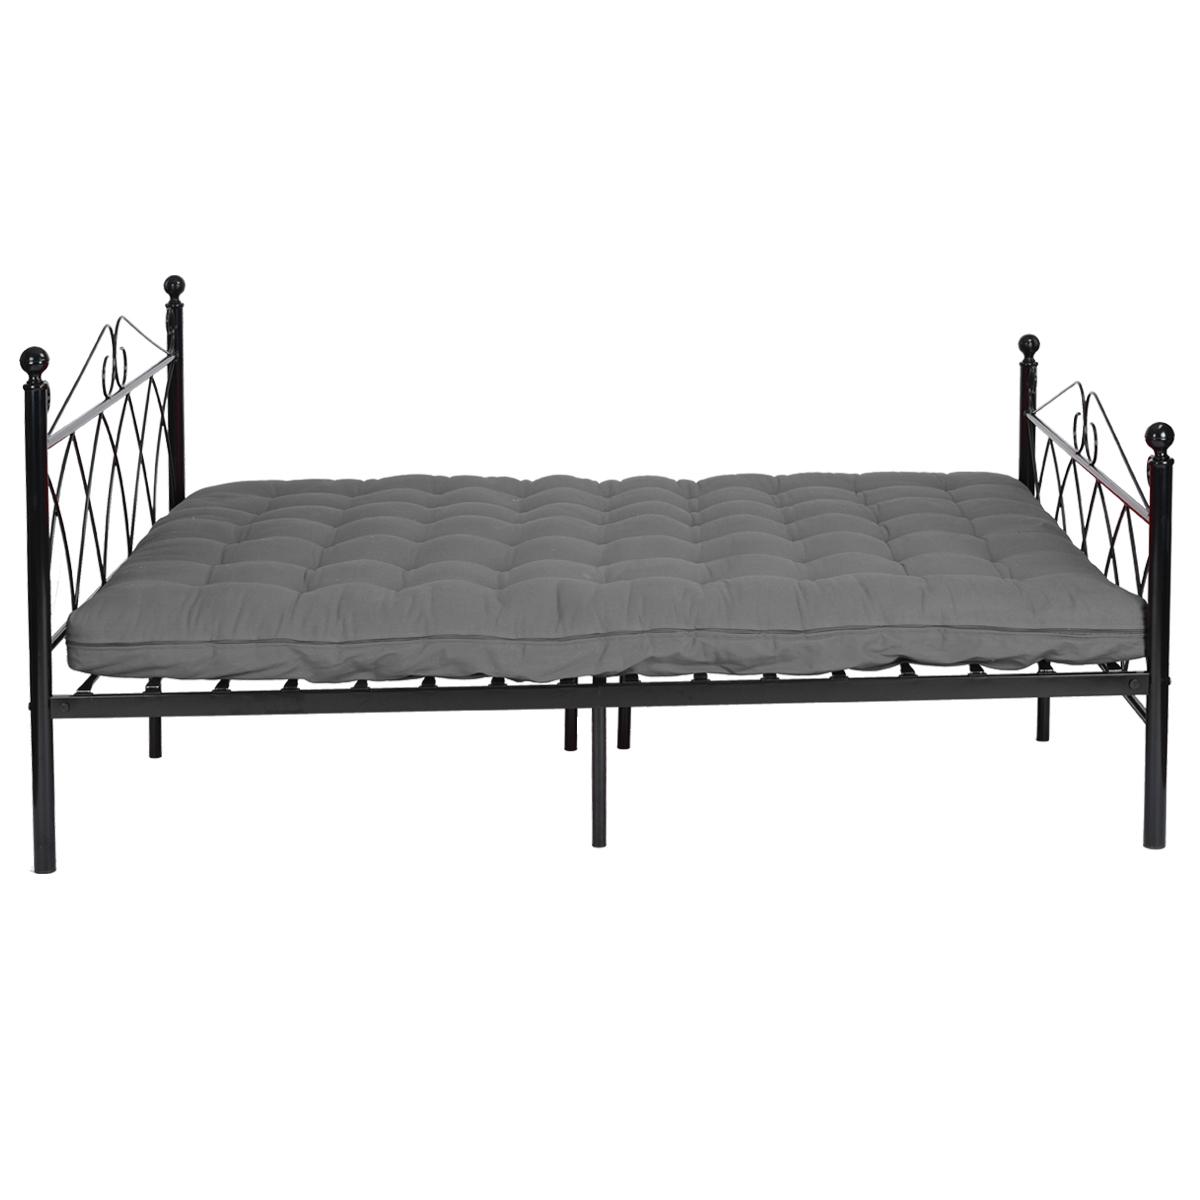 Full Size Metal Bed Frame Platform Headboards W 10 Legs